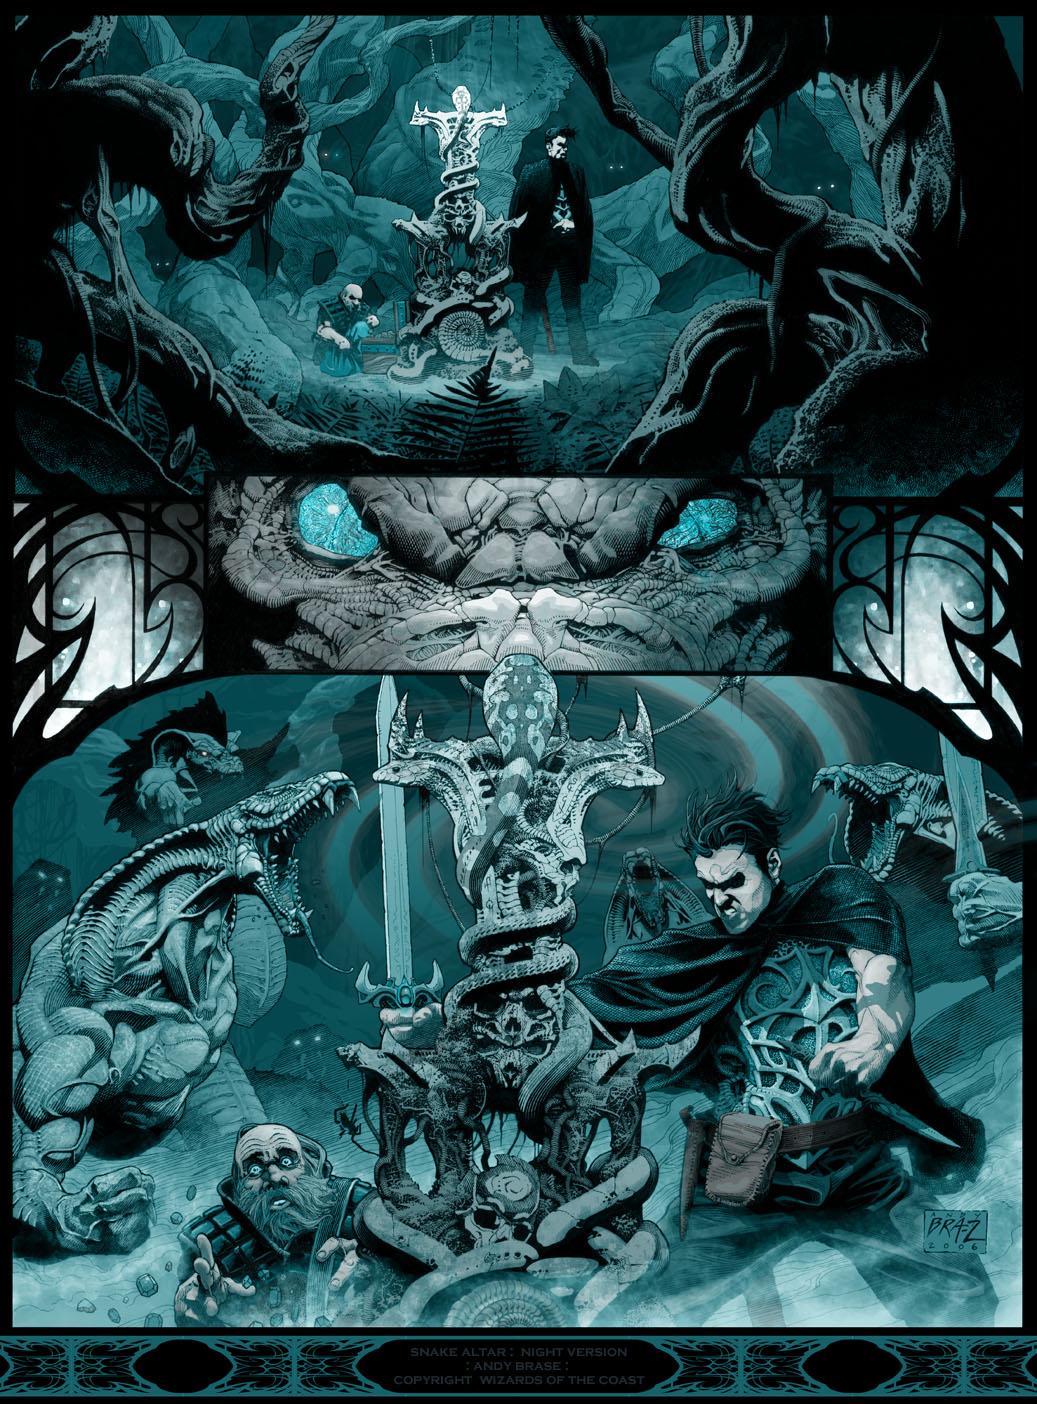 Snake Altar: Night version by andybrase